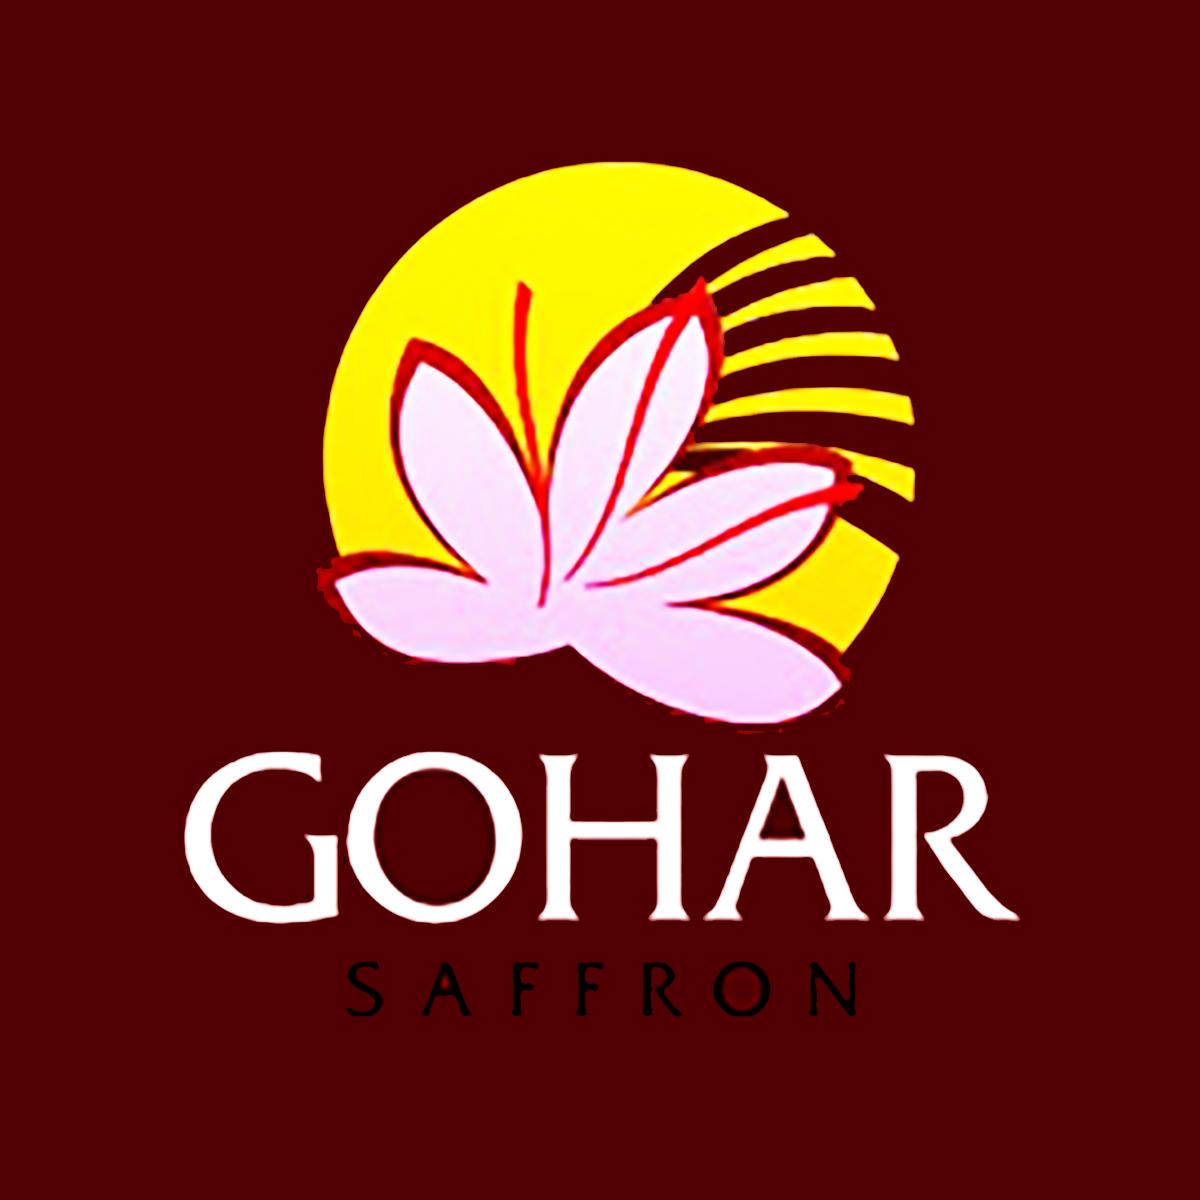 Gohar saffron